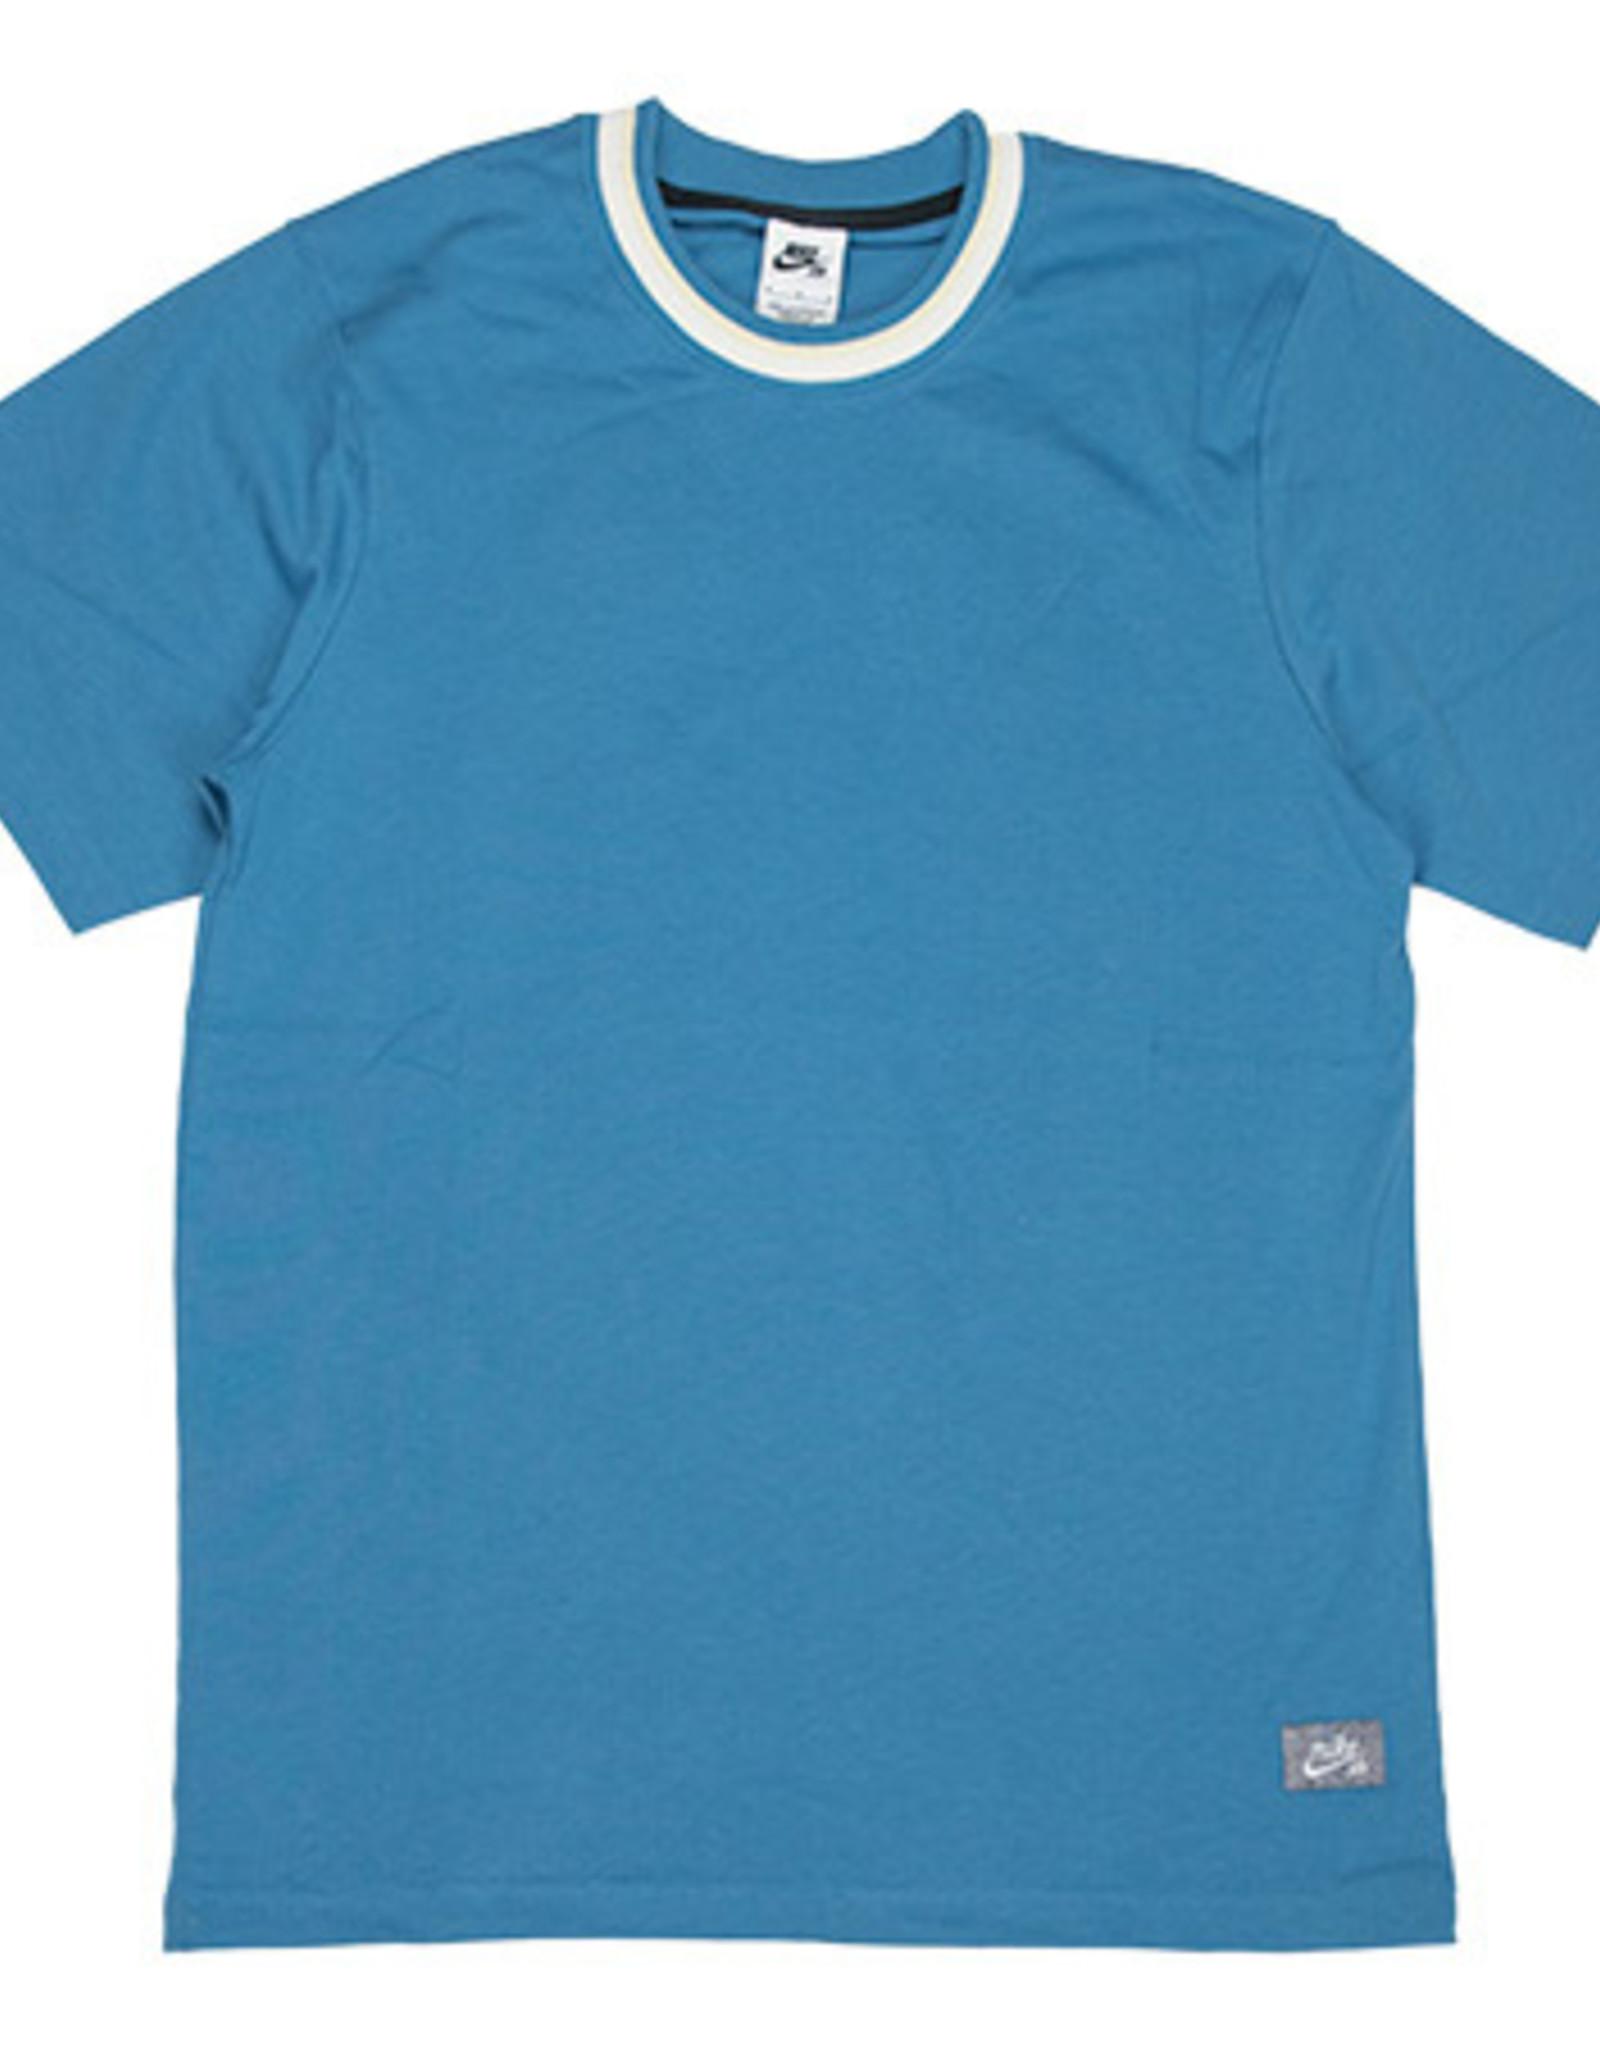 NIKE SB PREMIUM SUSTANABLE T-SHIRT - DUTCH BLUE/DUTCH BLUE